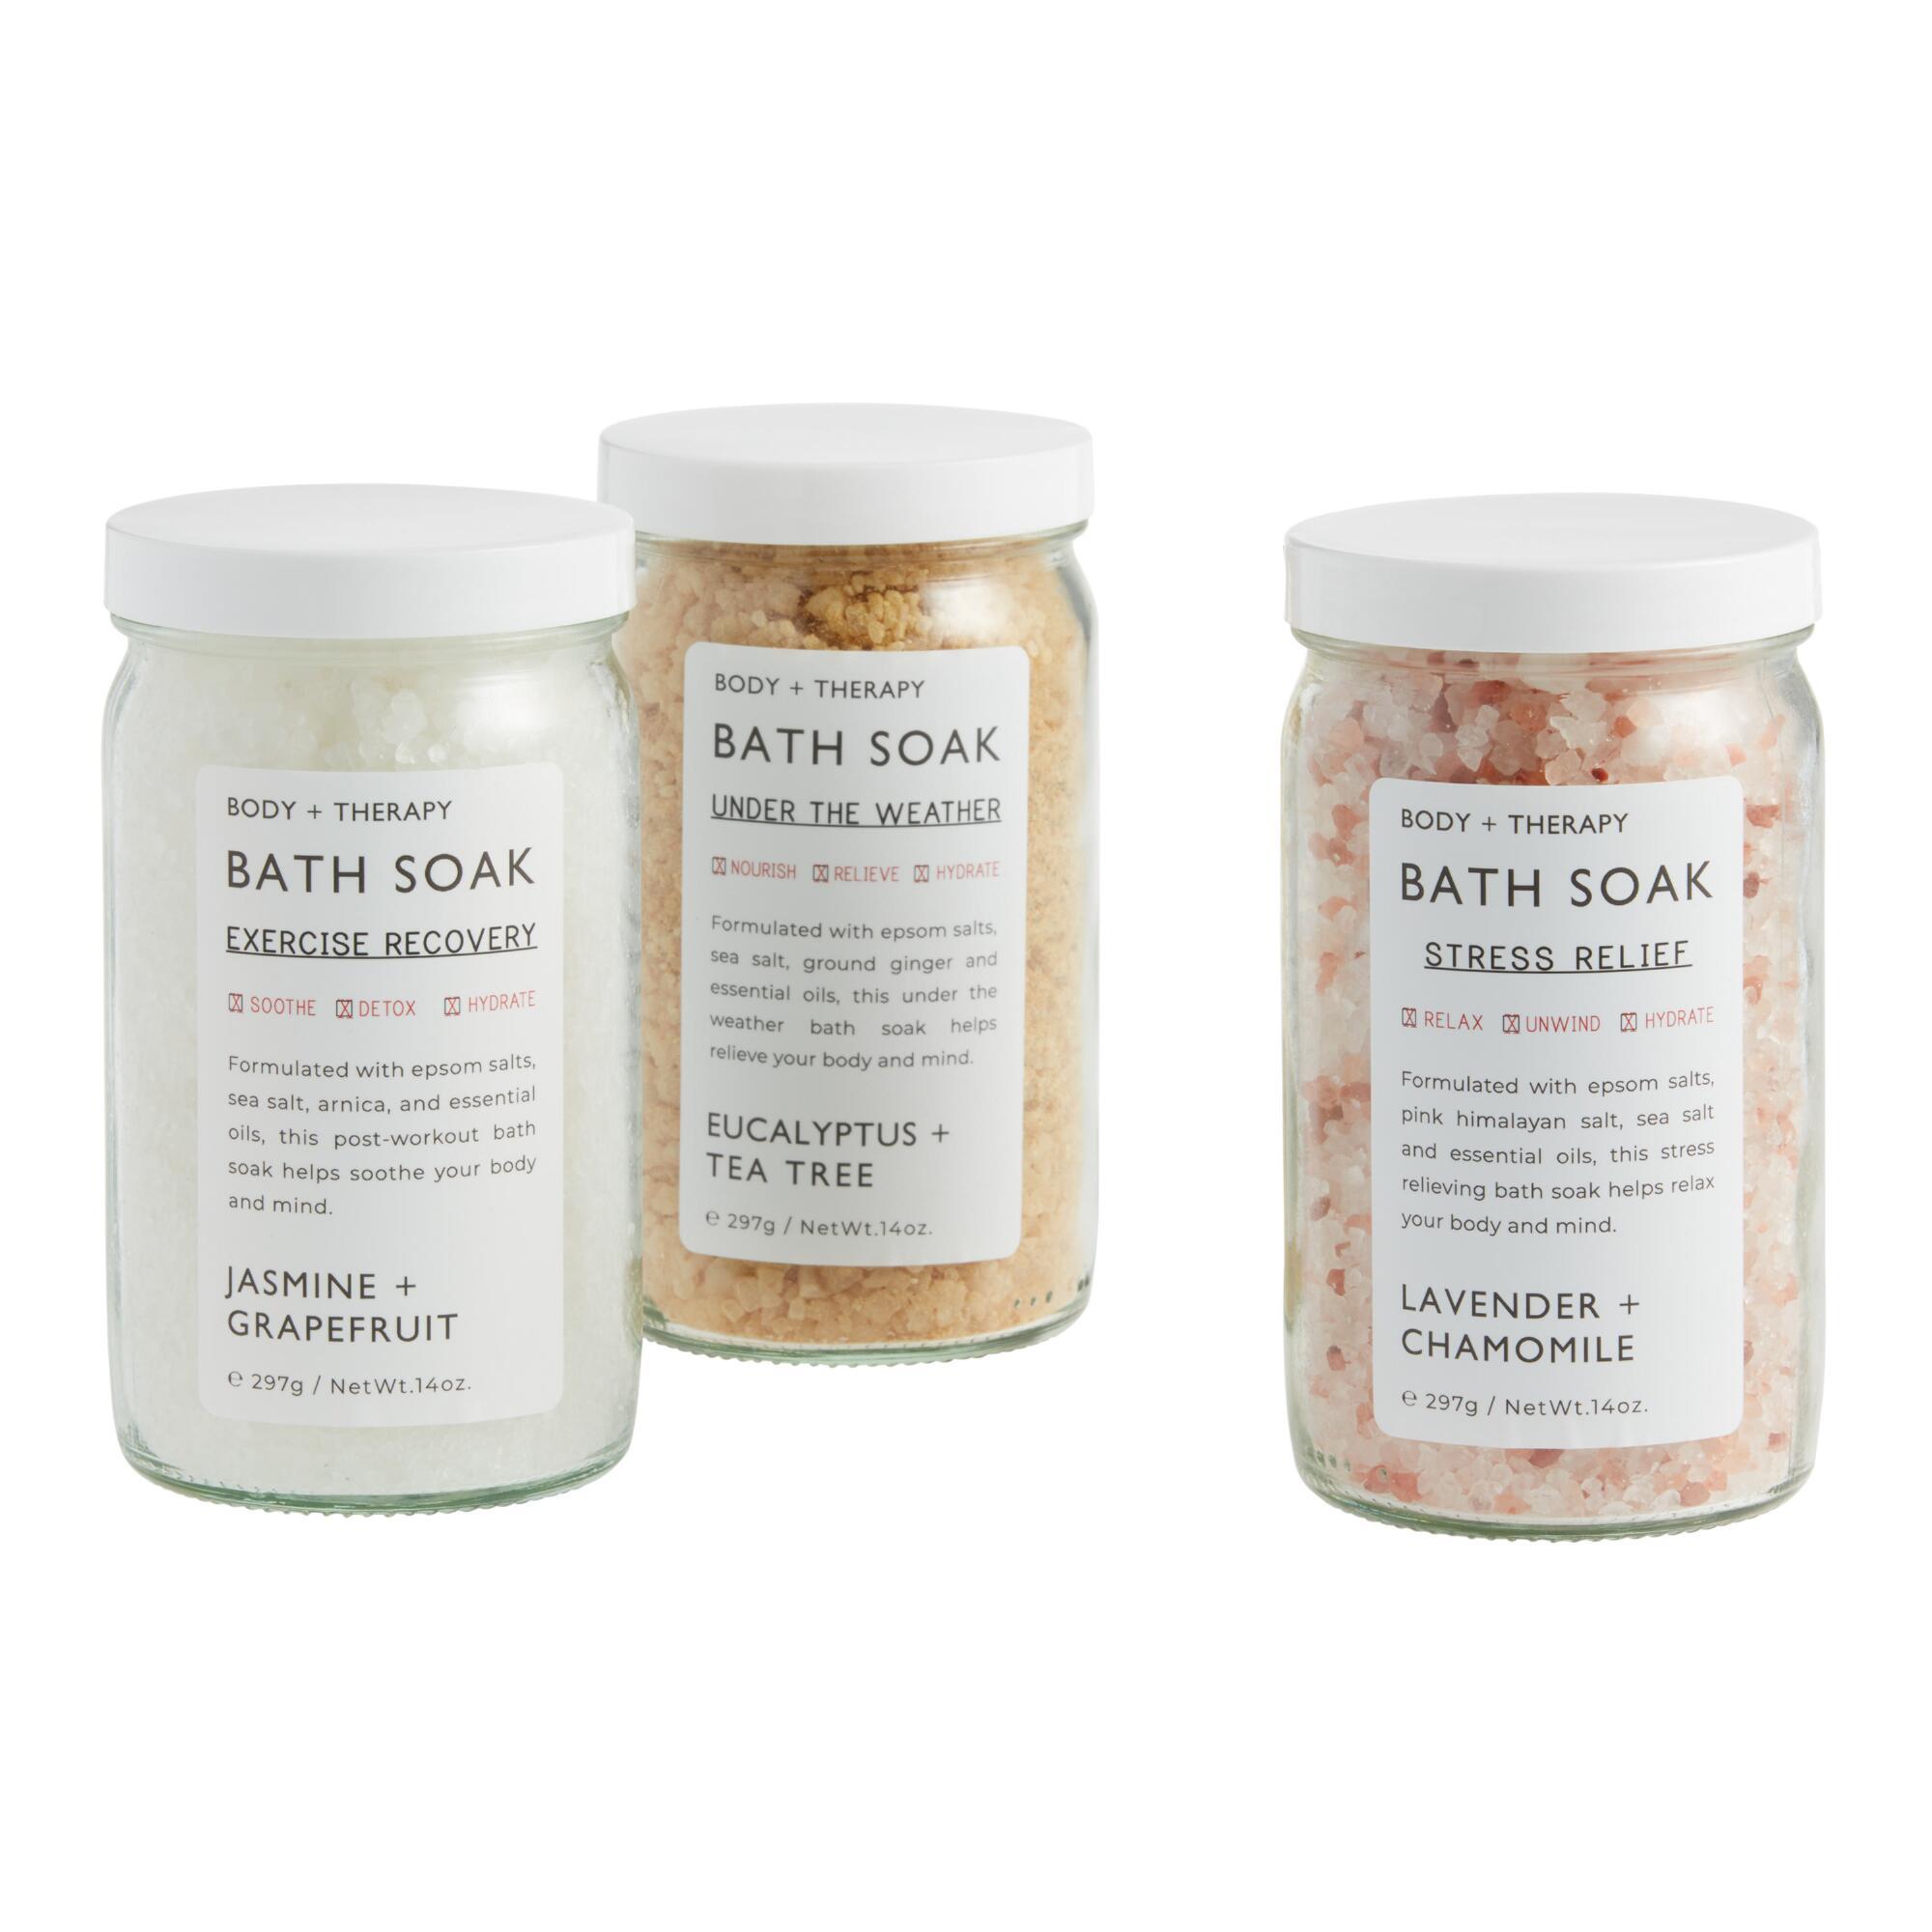 Body Therapy Bath Soak Collection $9.99